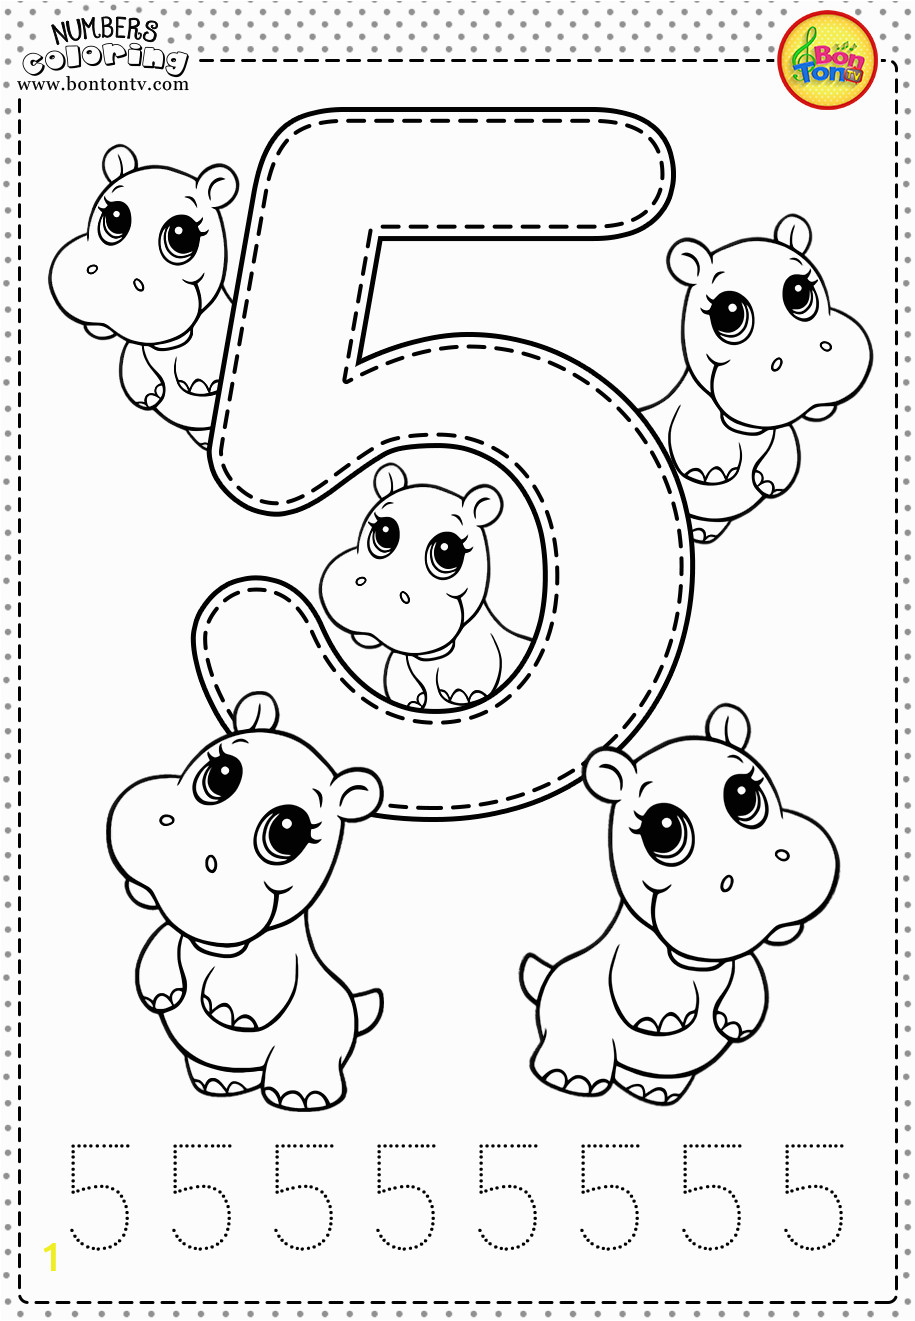 Coloring Number Pages for Kindergarten Number 5 Preschool Printables Free Worksheets and